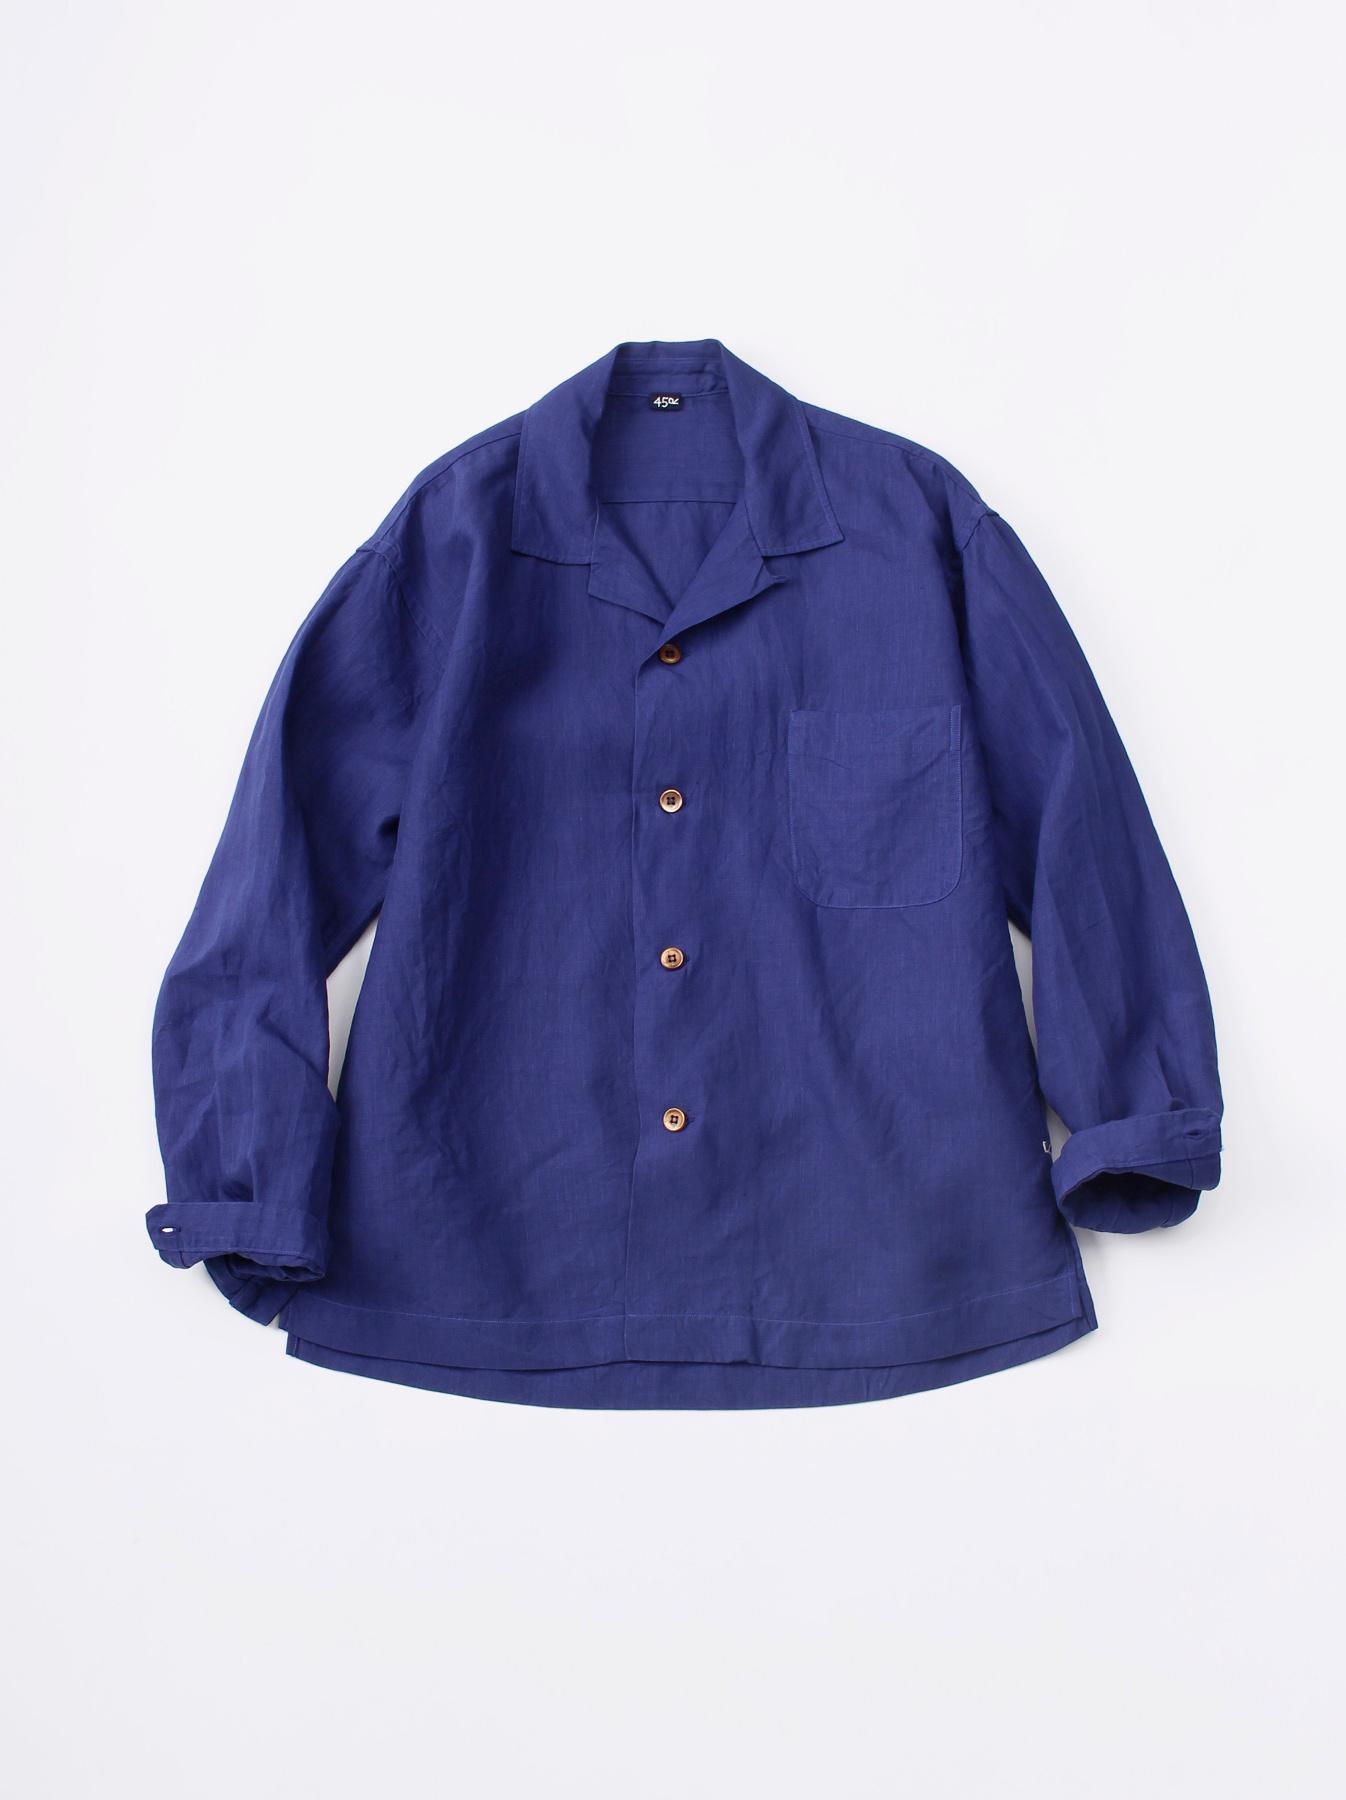 WH Piece-dyed Linen 908 Safari Shirt-1